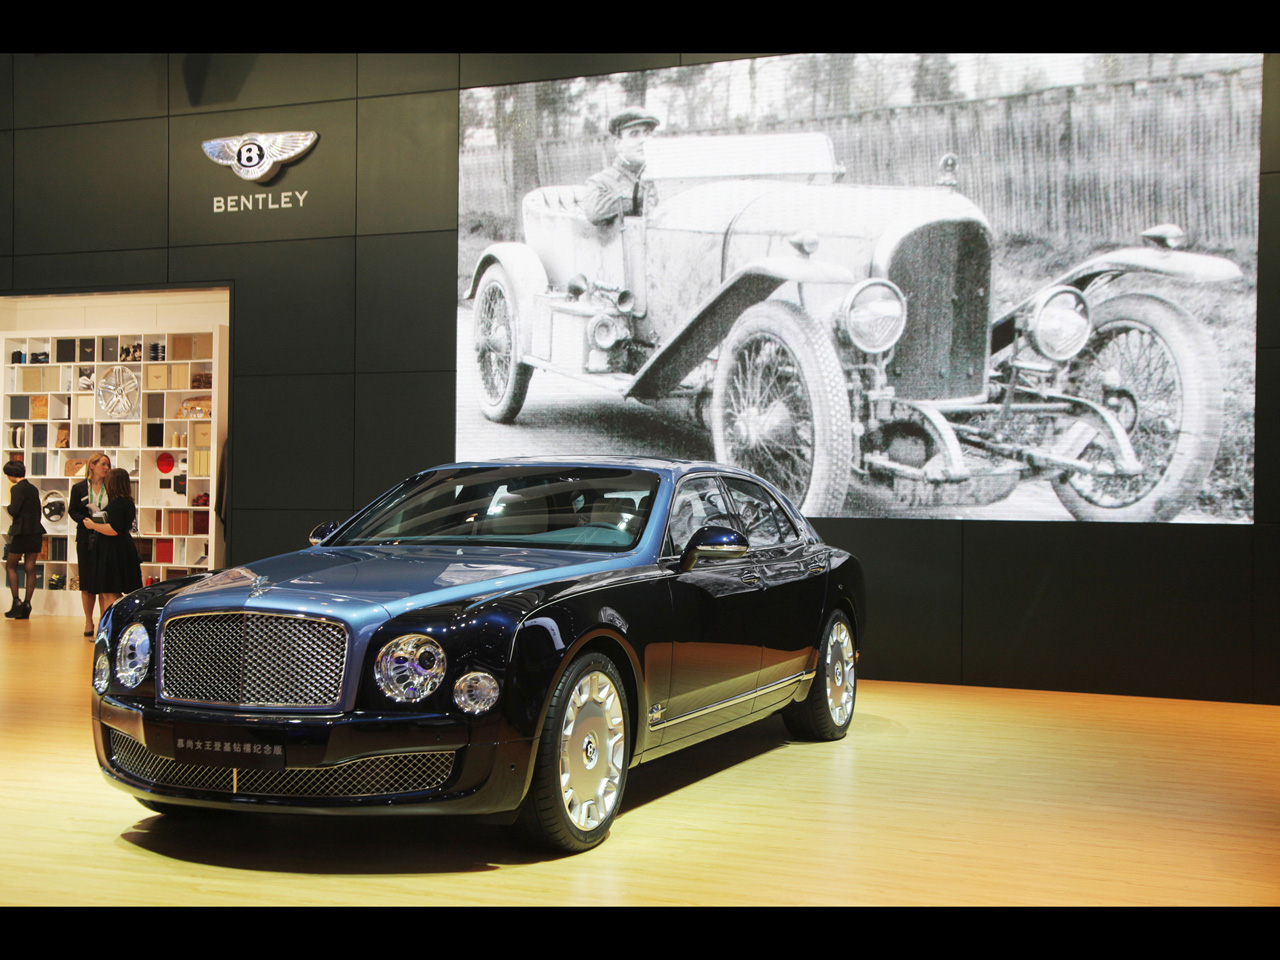 2012 Bentley Mulsanne Diamond Jubilee Edition Wallpapers by Cars ...